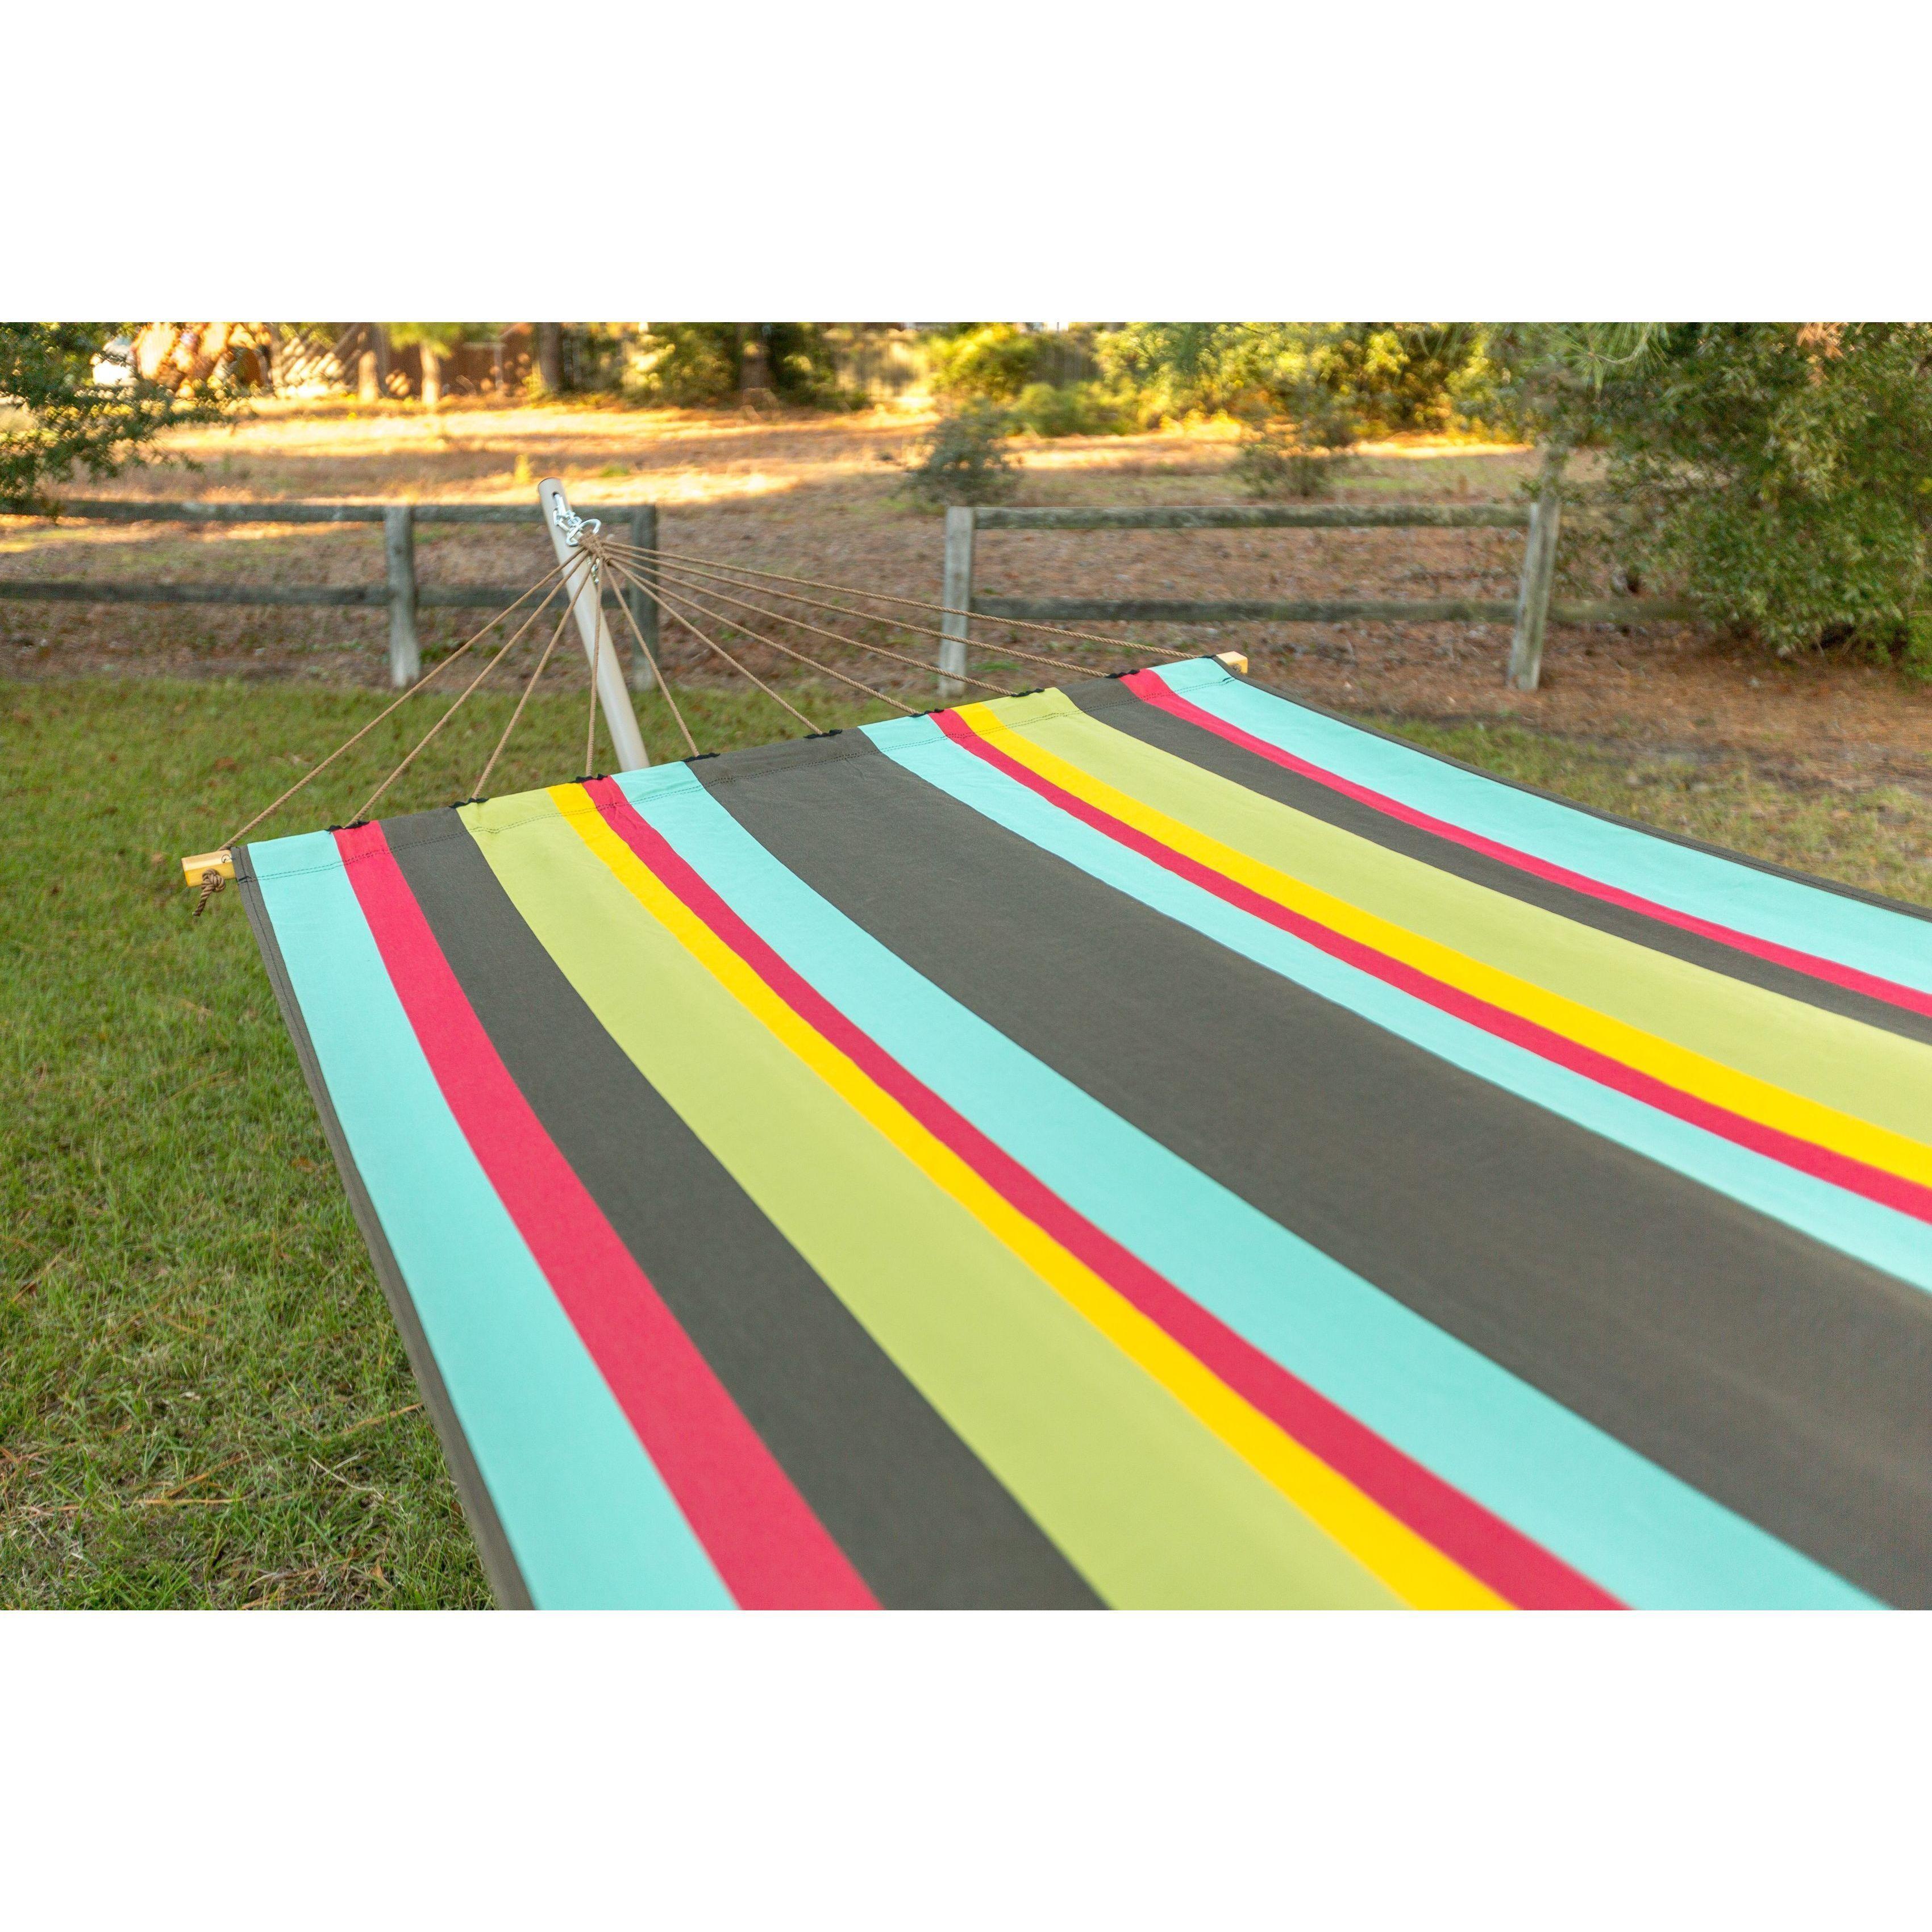 Pawleys island hammocks castaway large single layer fabric hammock